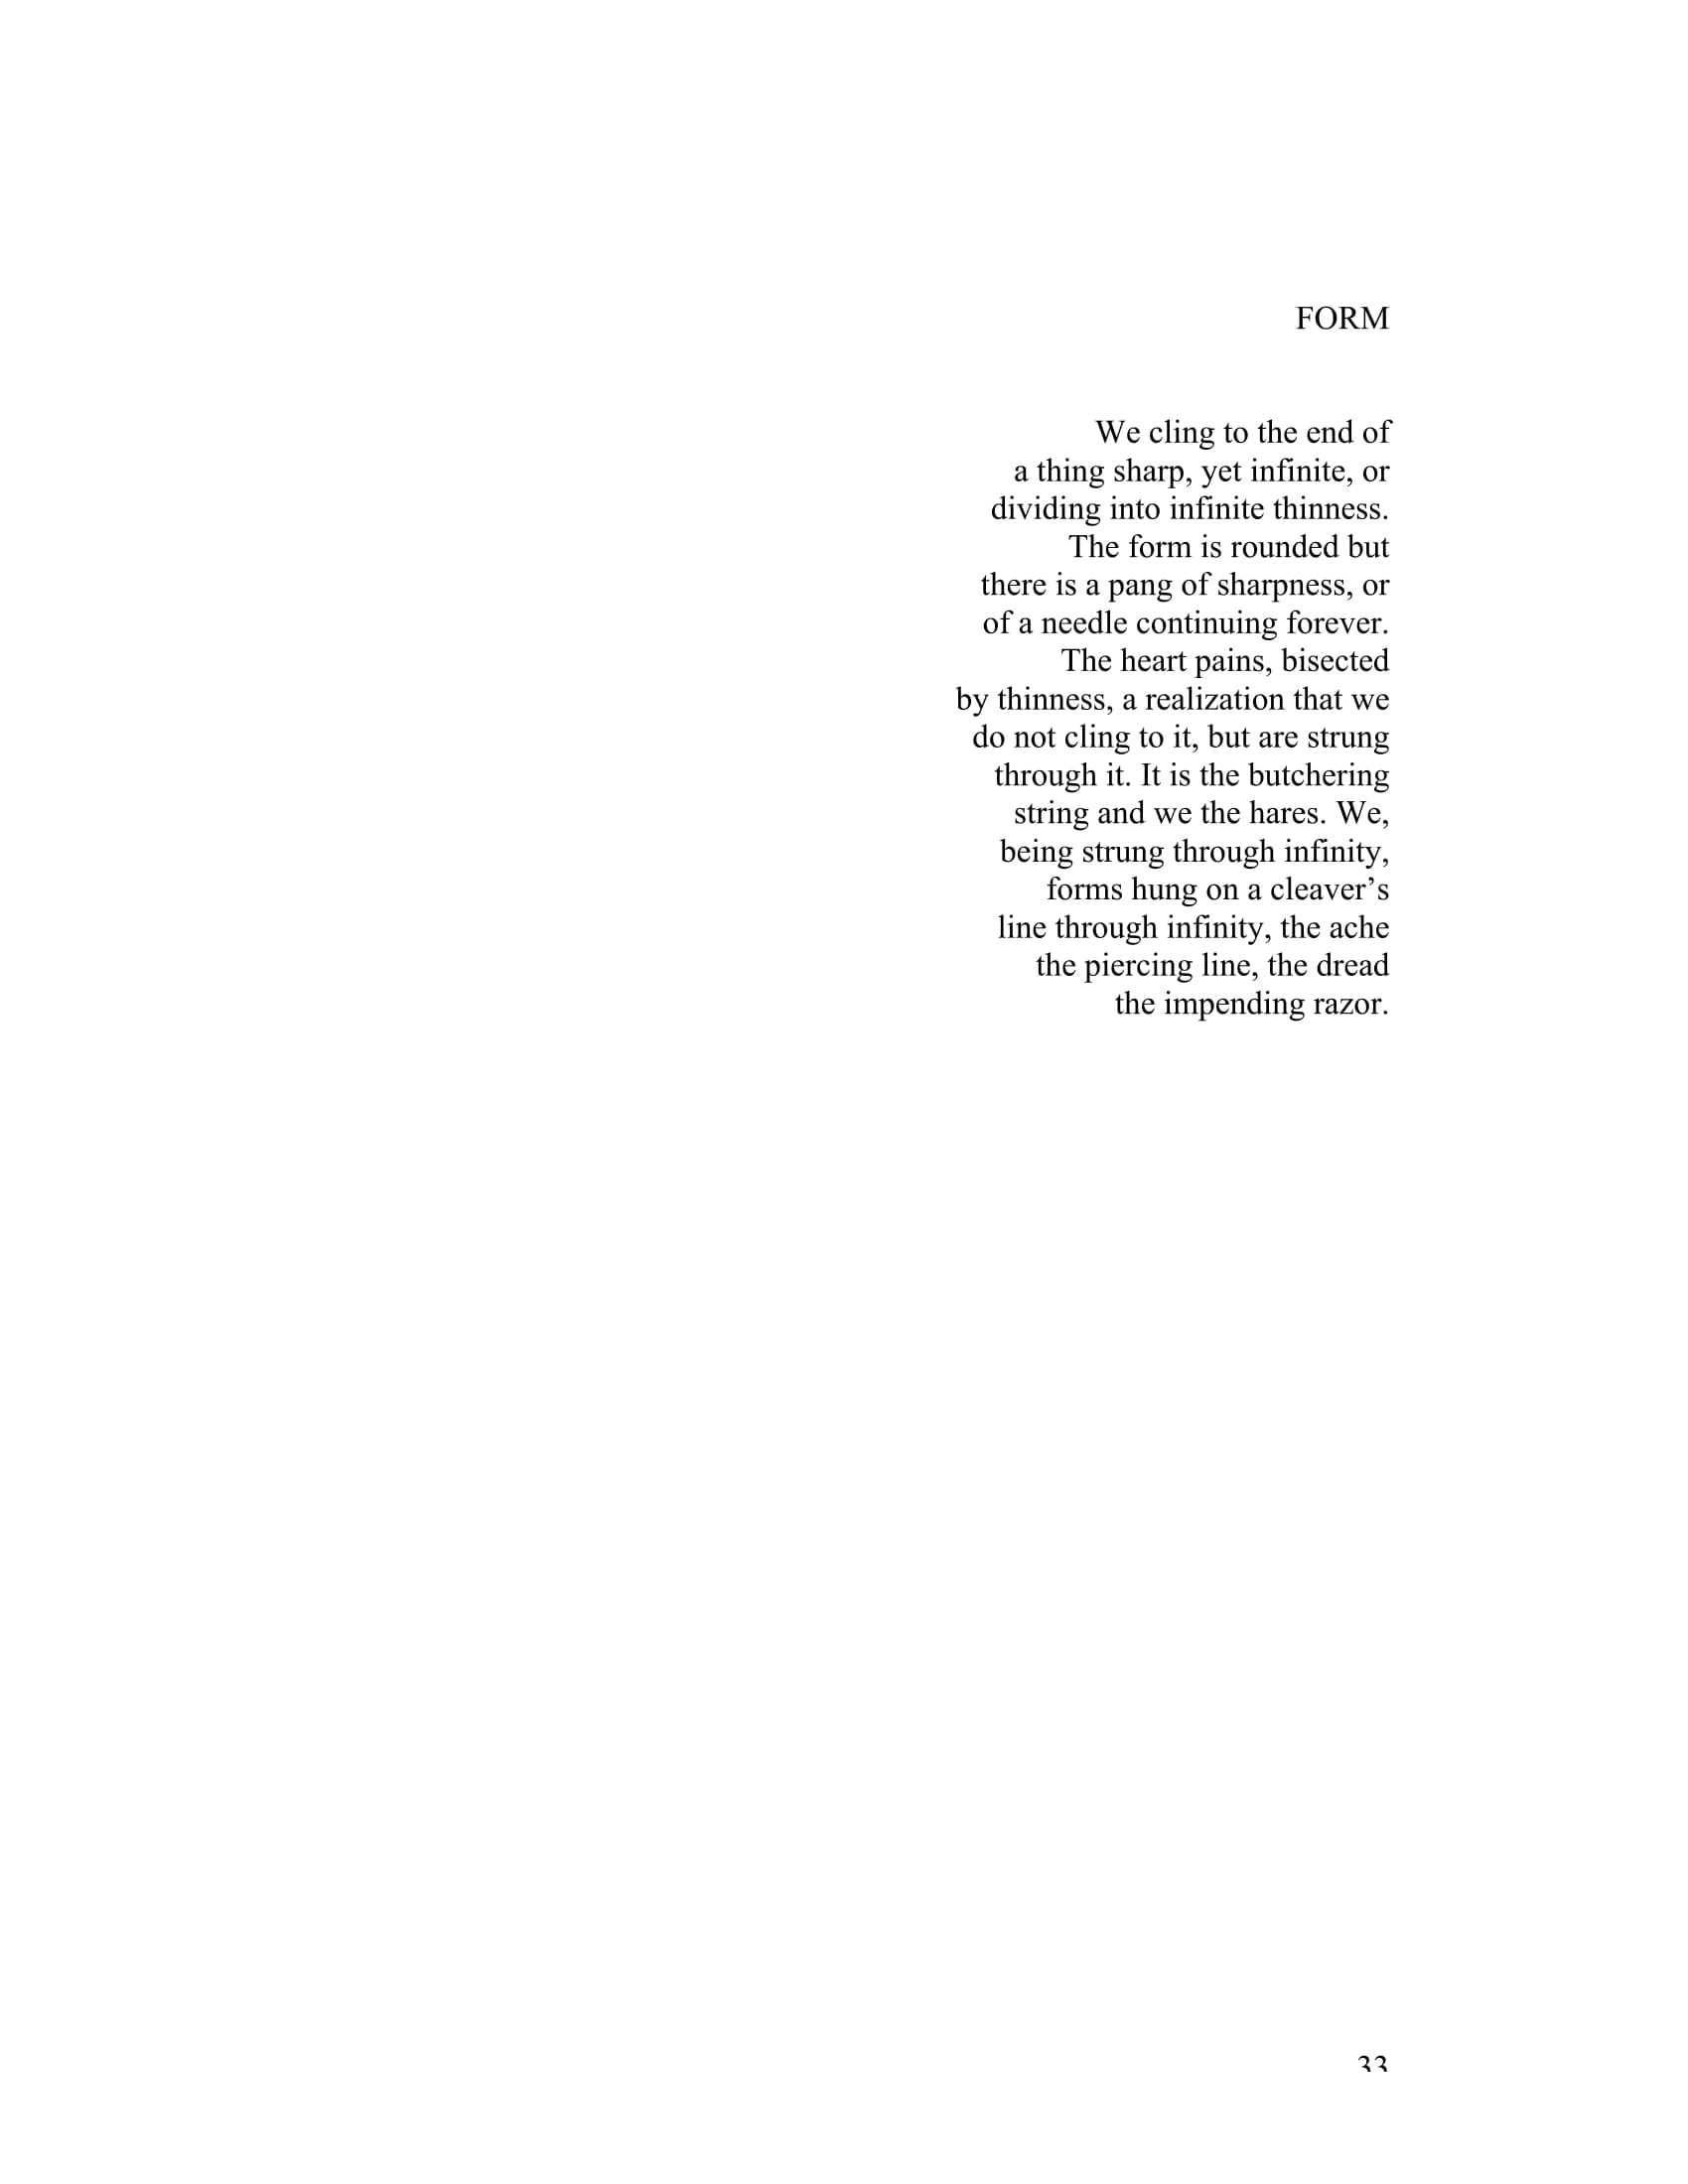 2017.10.31 UNWINDING PAGE-33.jpg